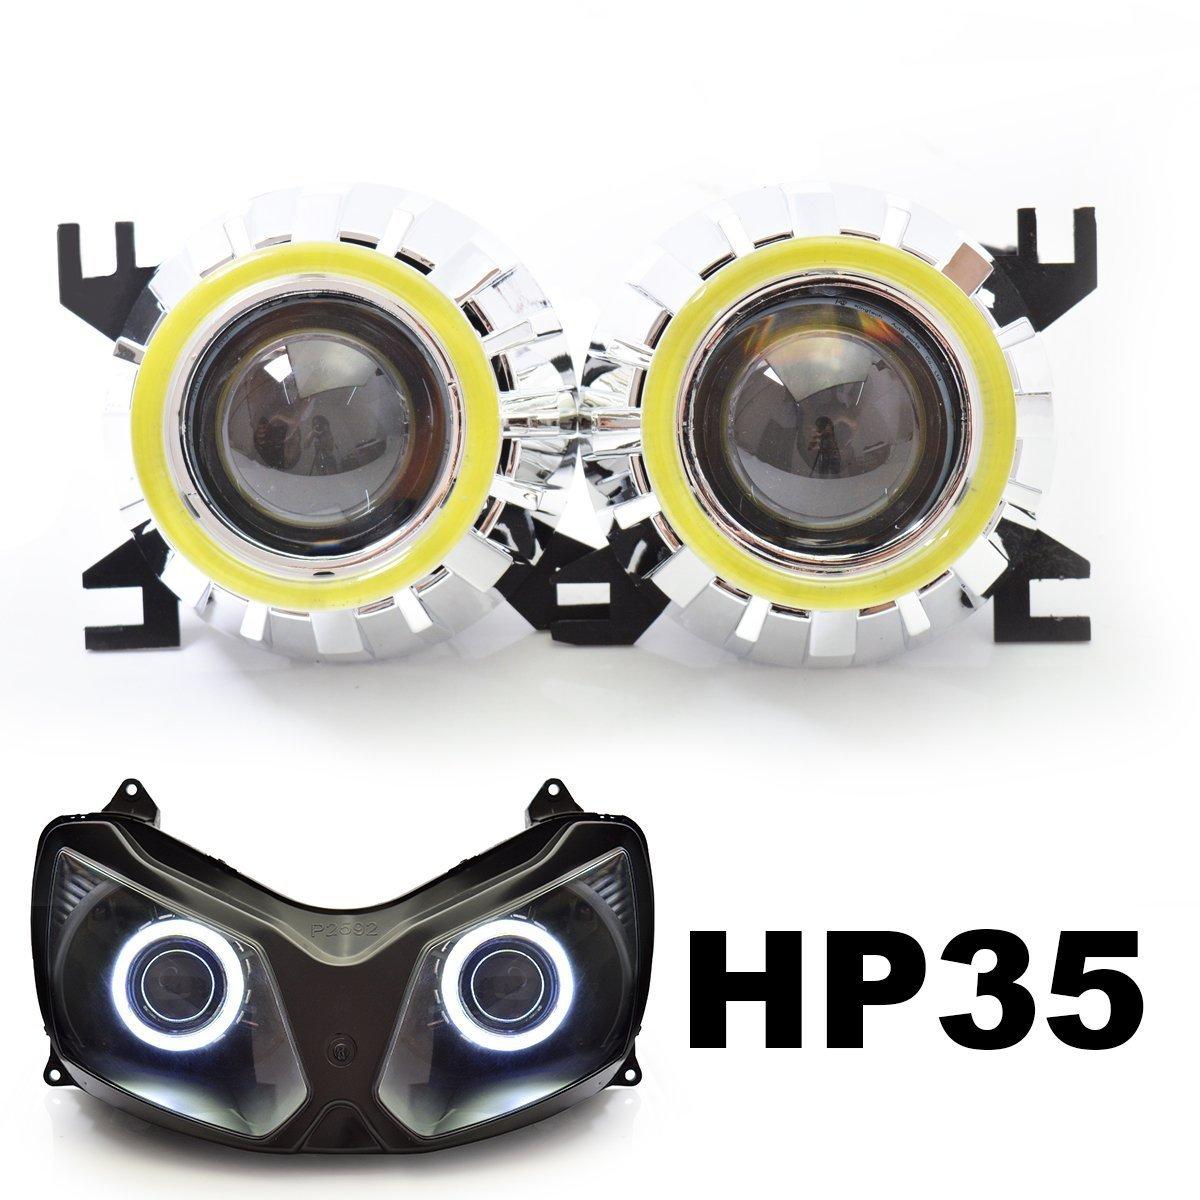 KT Tailor-Made HID Projector Kit HP35 for Kawasaki Ninja ZX-12R 2002-2008 White Angel Eye